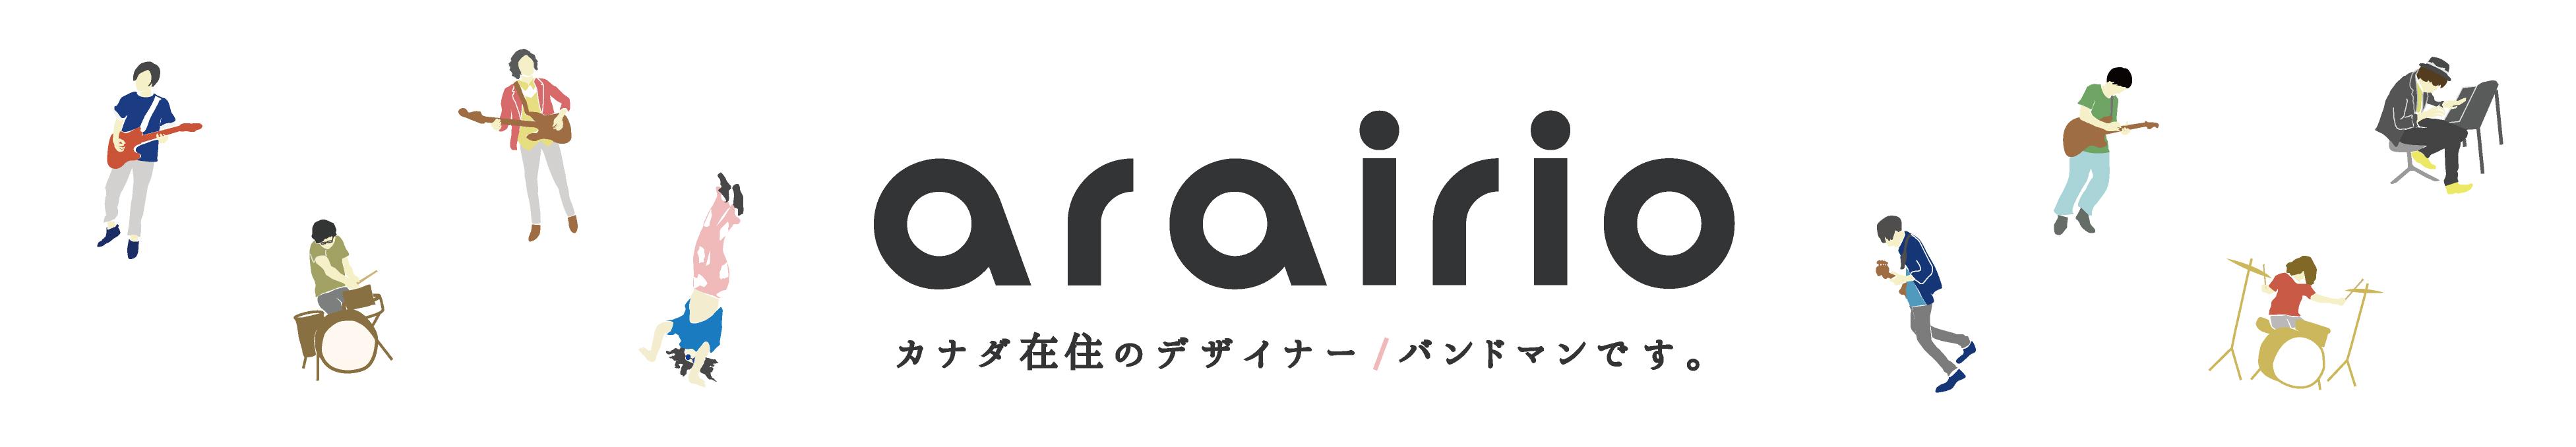 arairio.com - 新井リオの英語BLOG